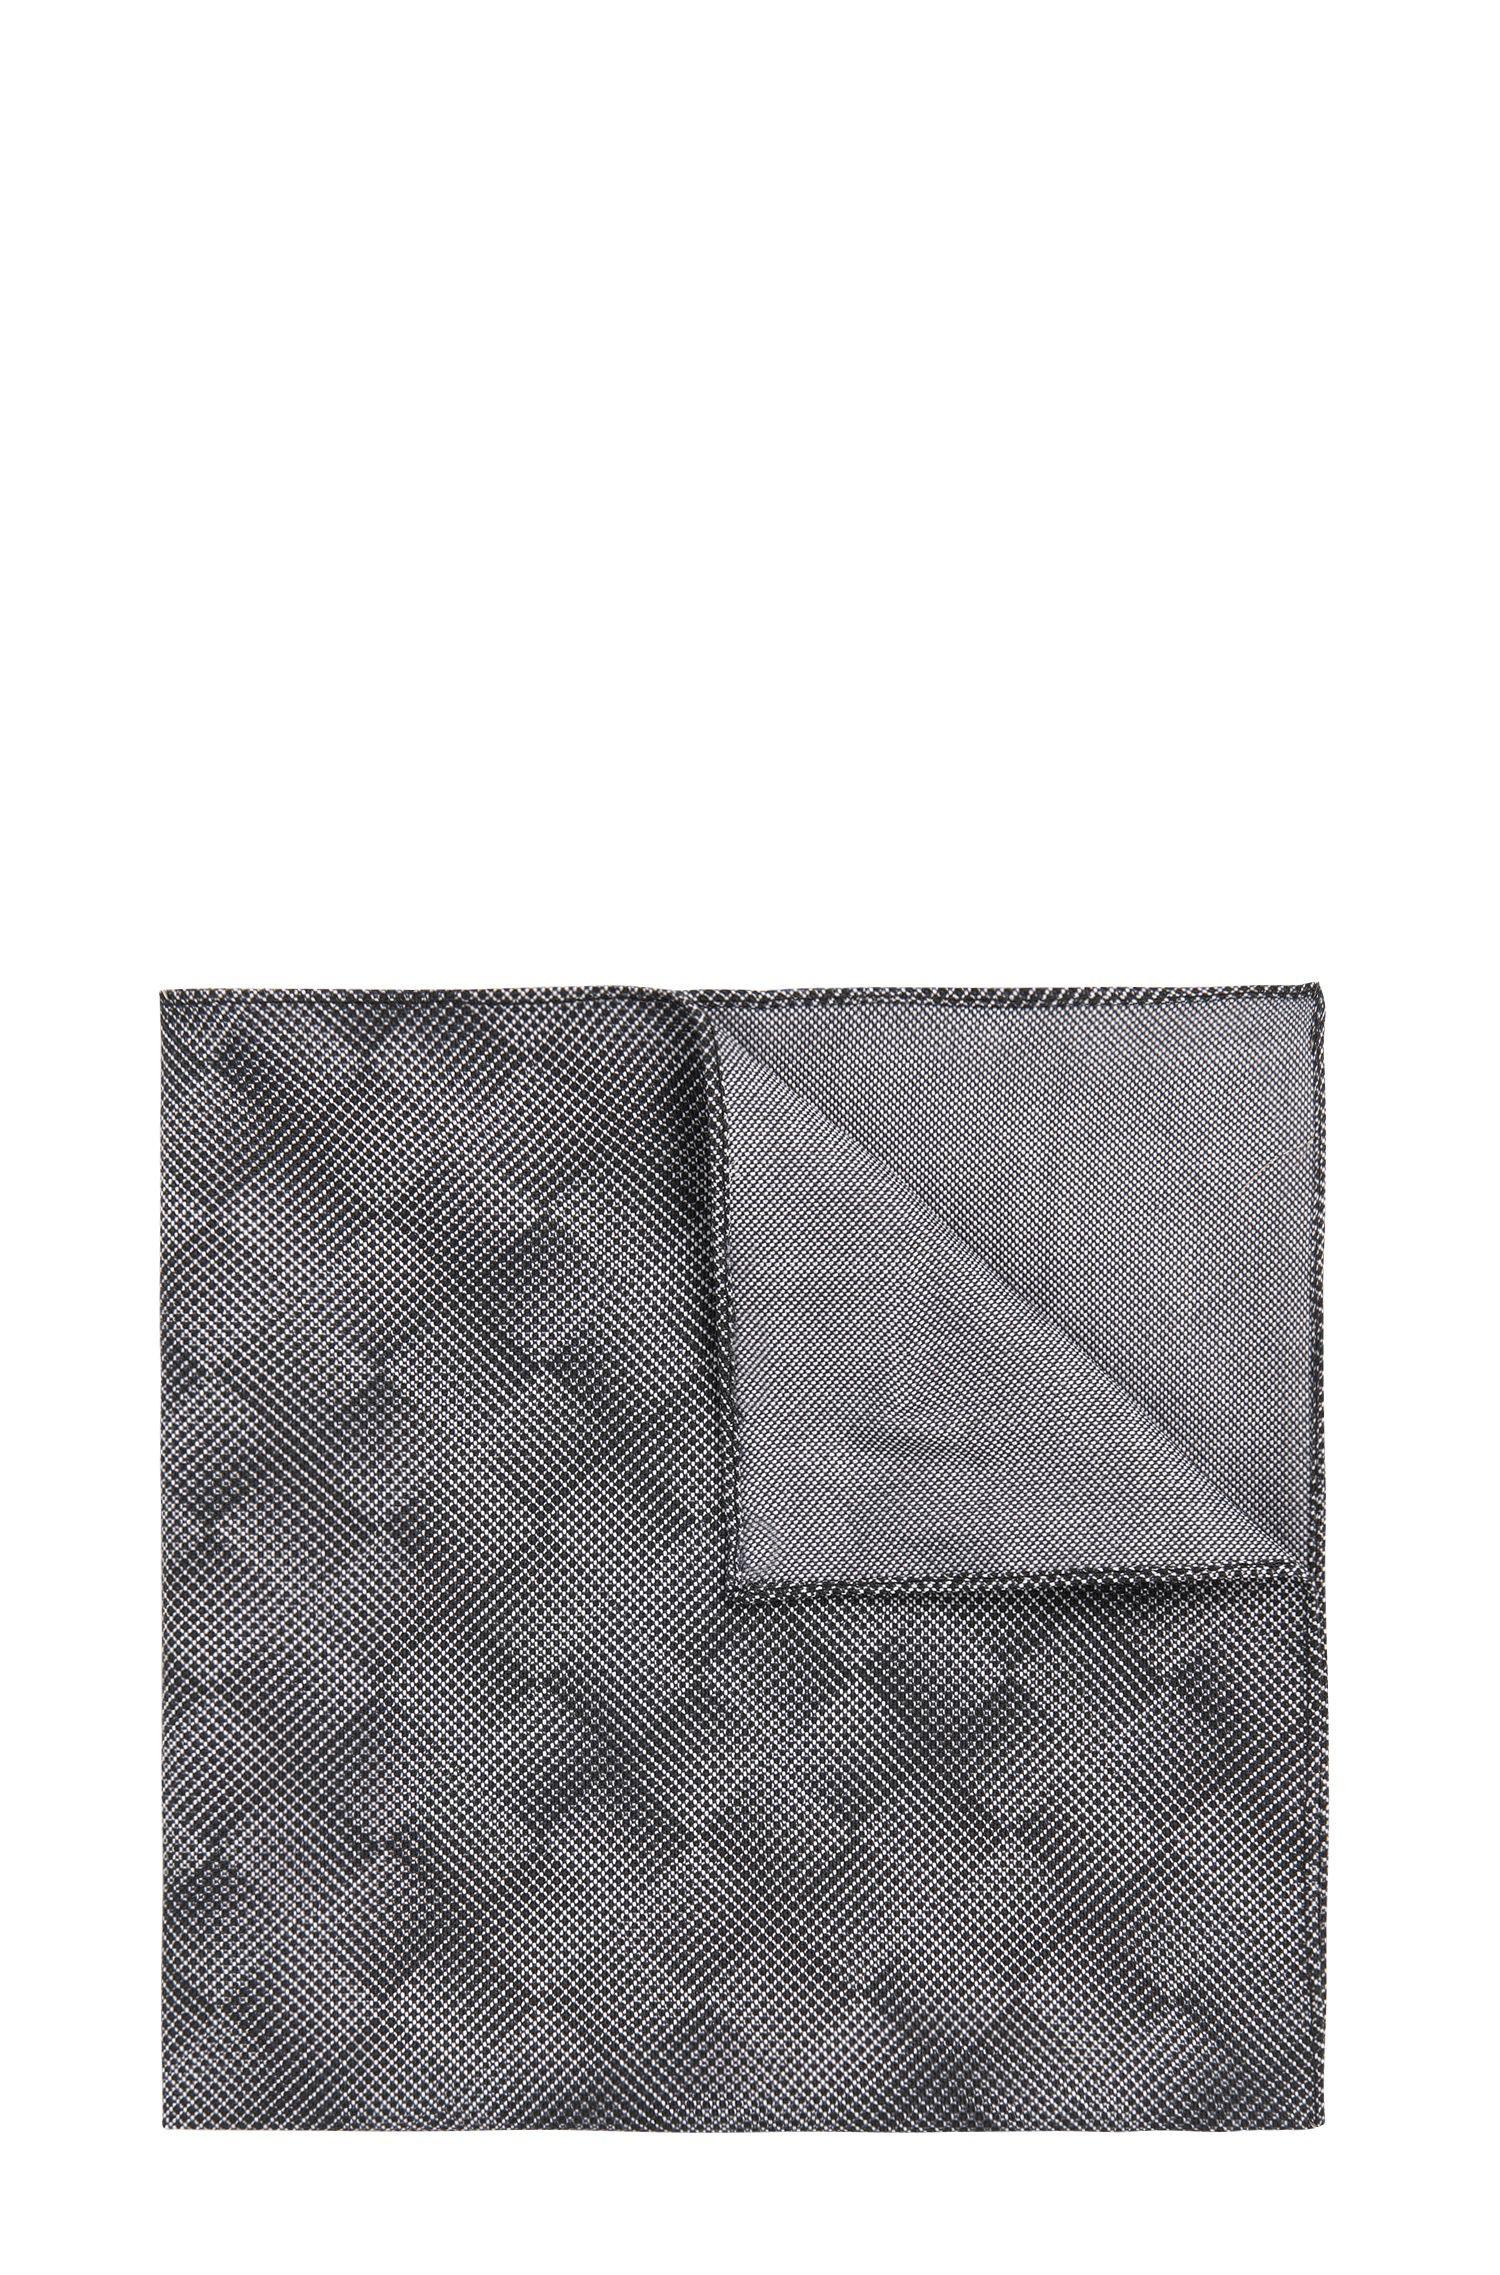 'Pocket sq. cm 33x33' | Italian Cotton Patterned Pocket Square